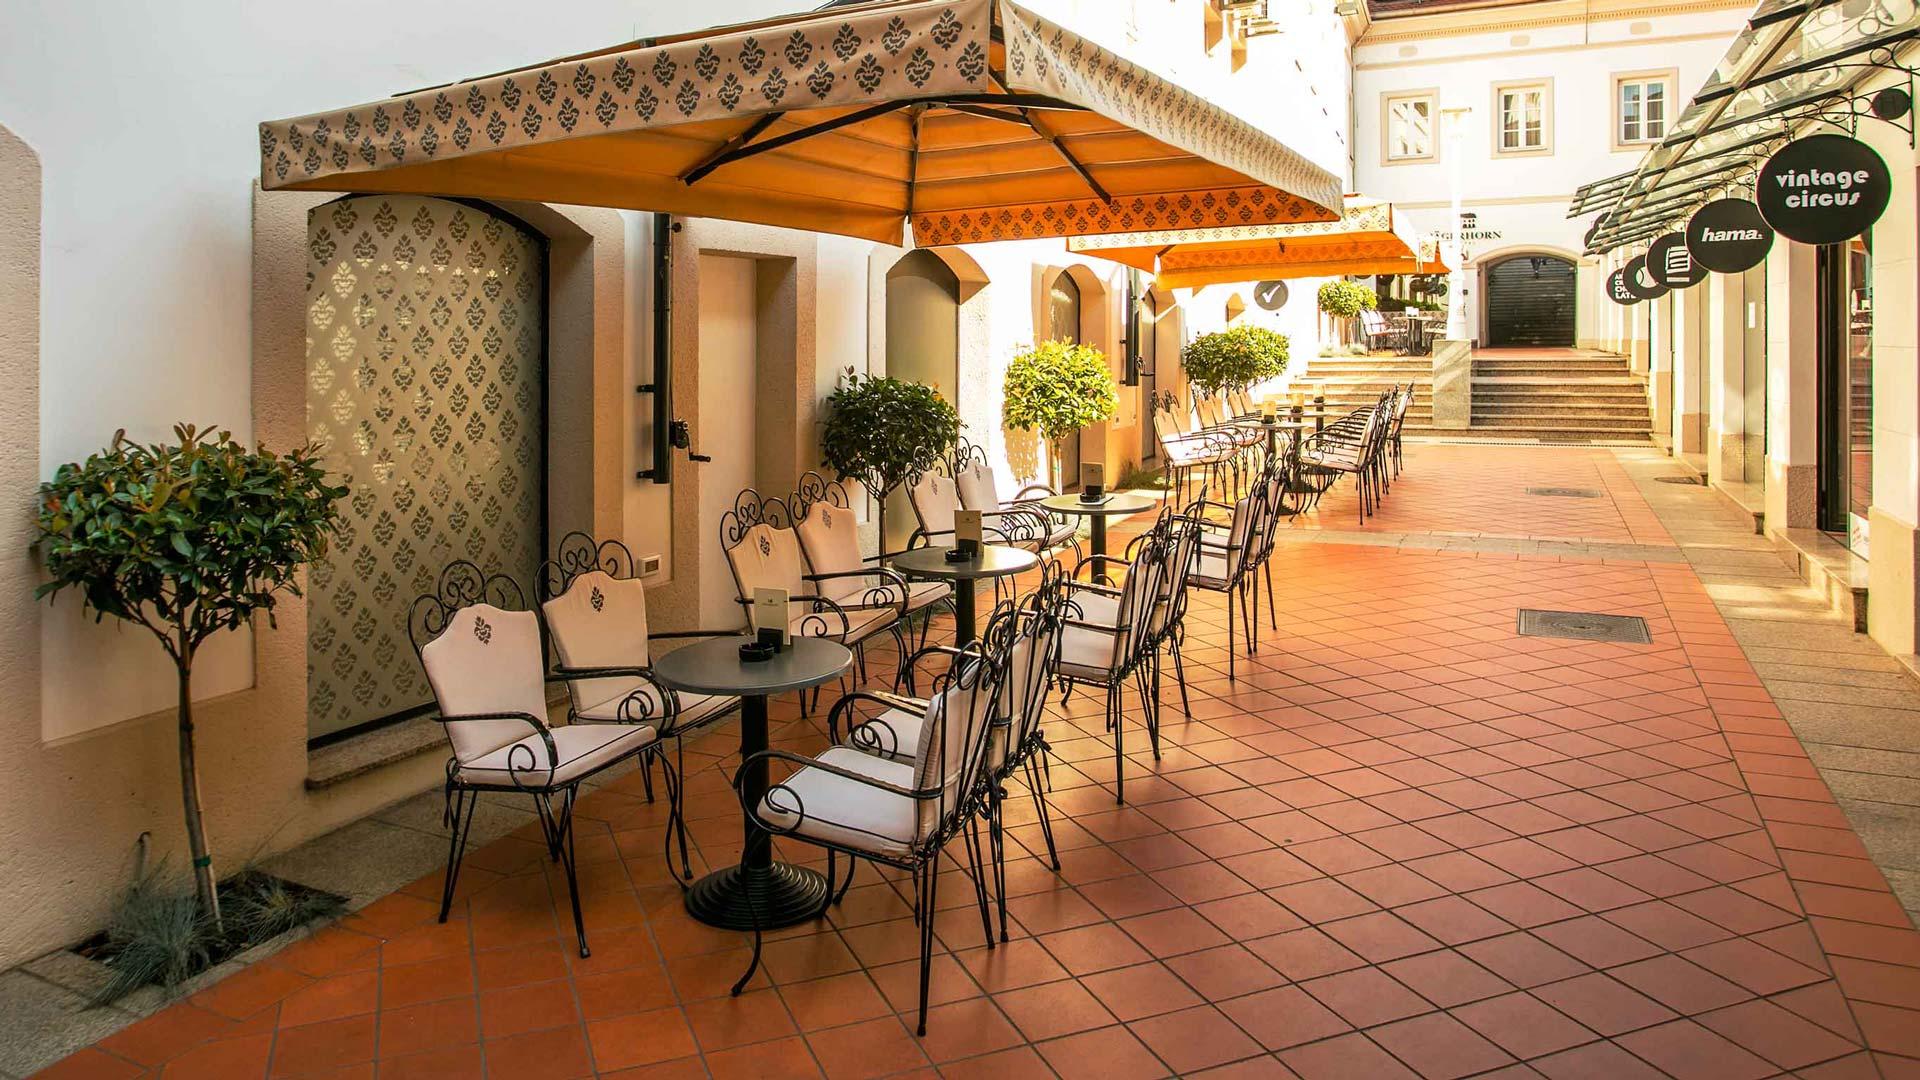 Hotel j gerhorn boutique hotel zagreb croatia for Design boutique hotel zagreb